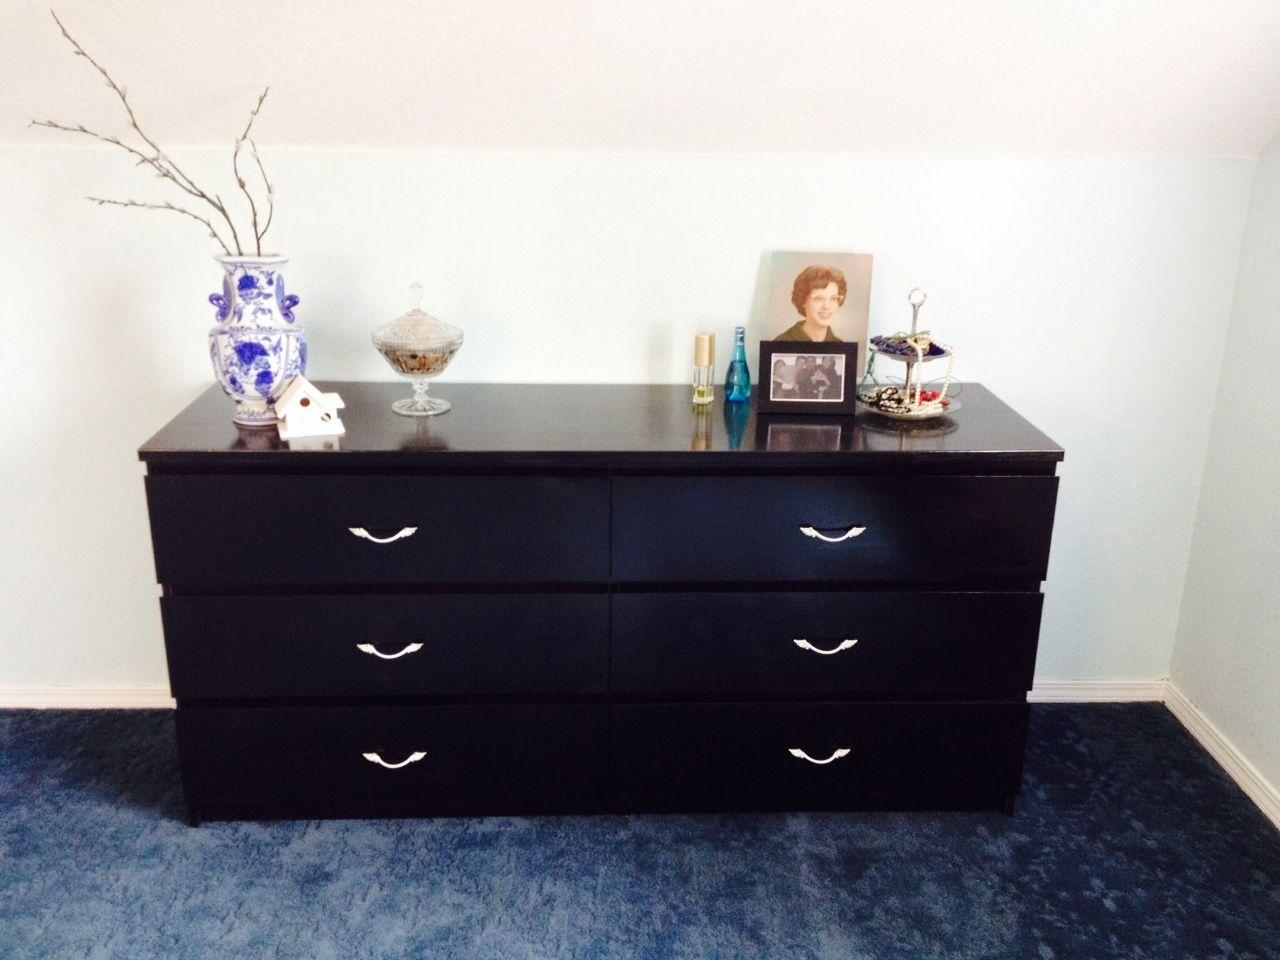 Cassettiera Malm Ikea Usata.Ikea Upcycle Malm Dresser With Images Malm Dresser Dresser As